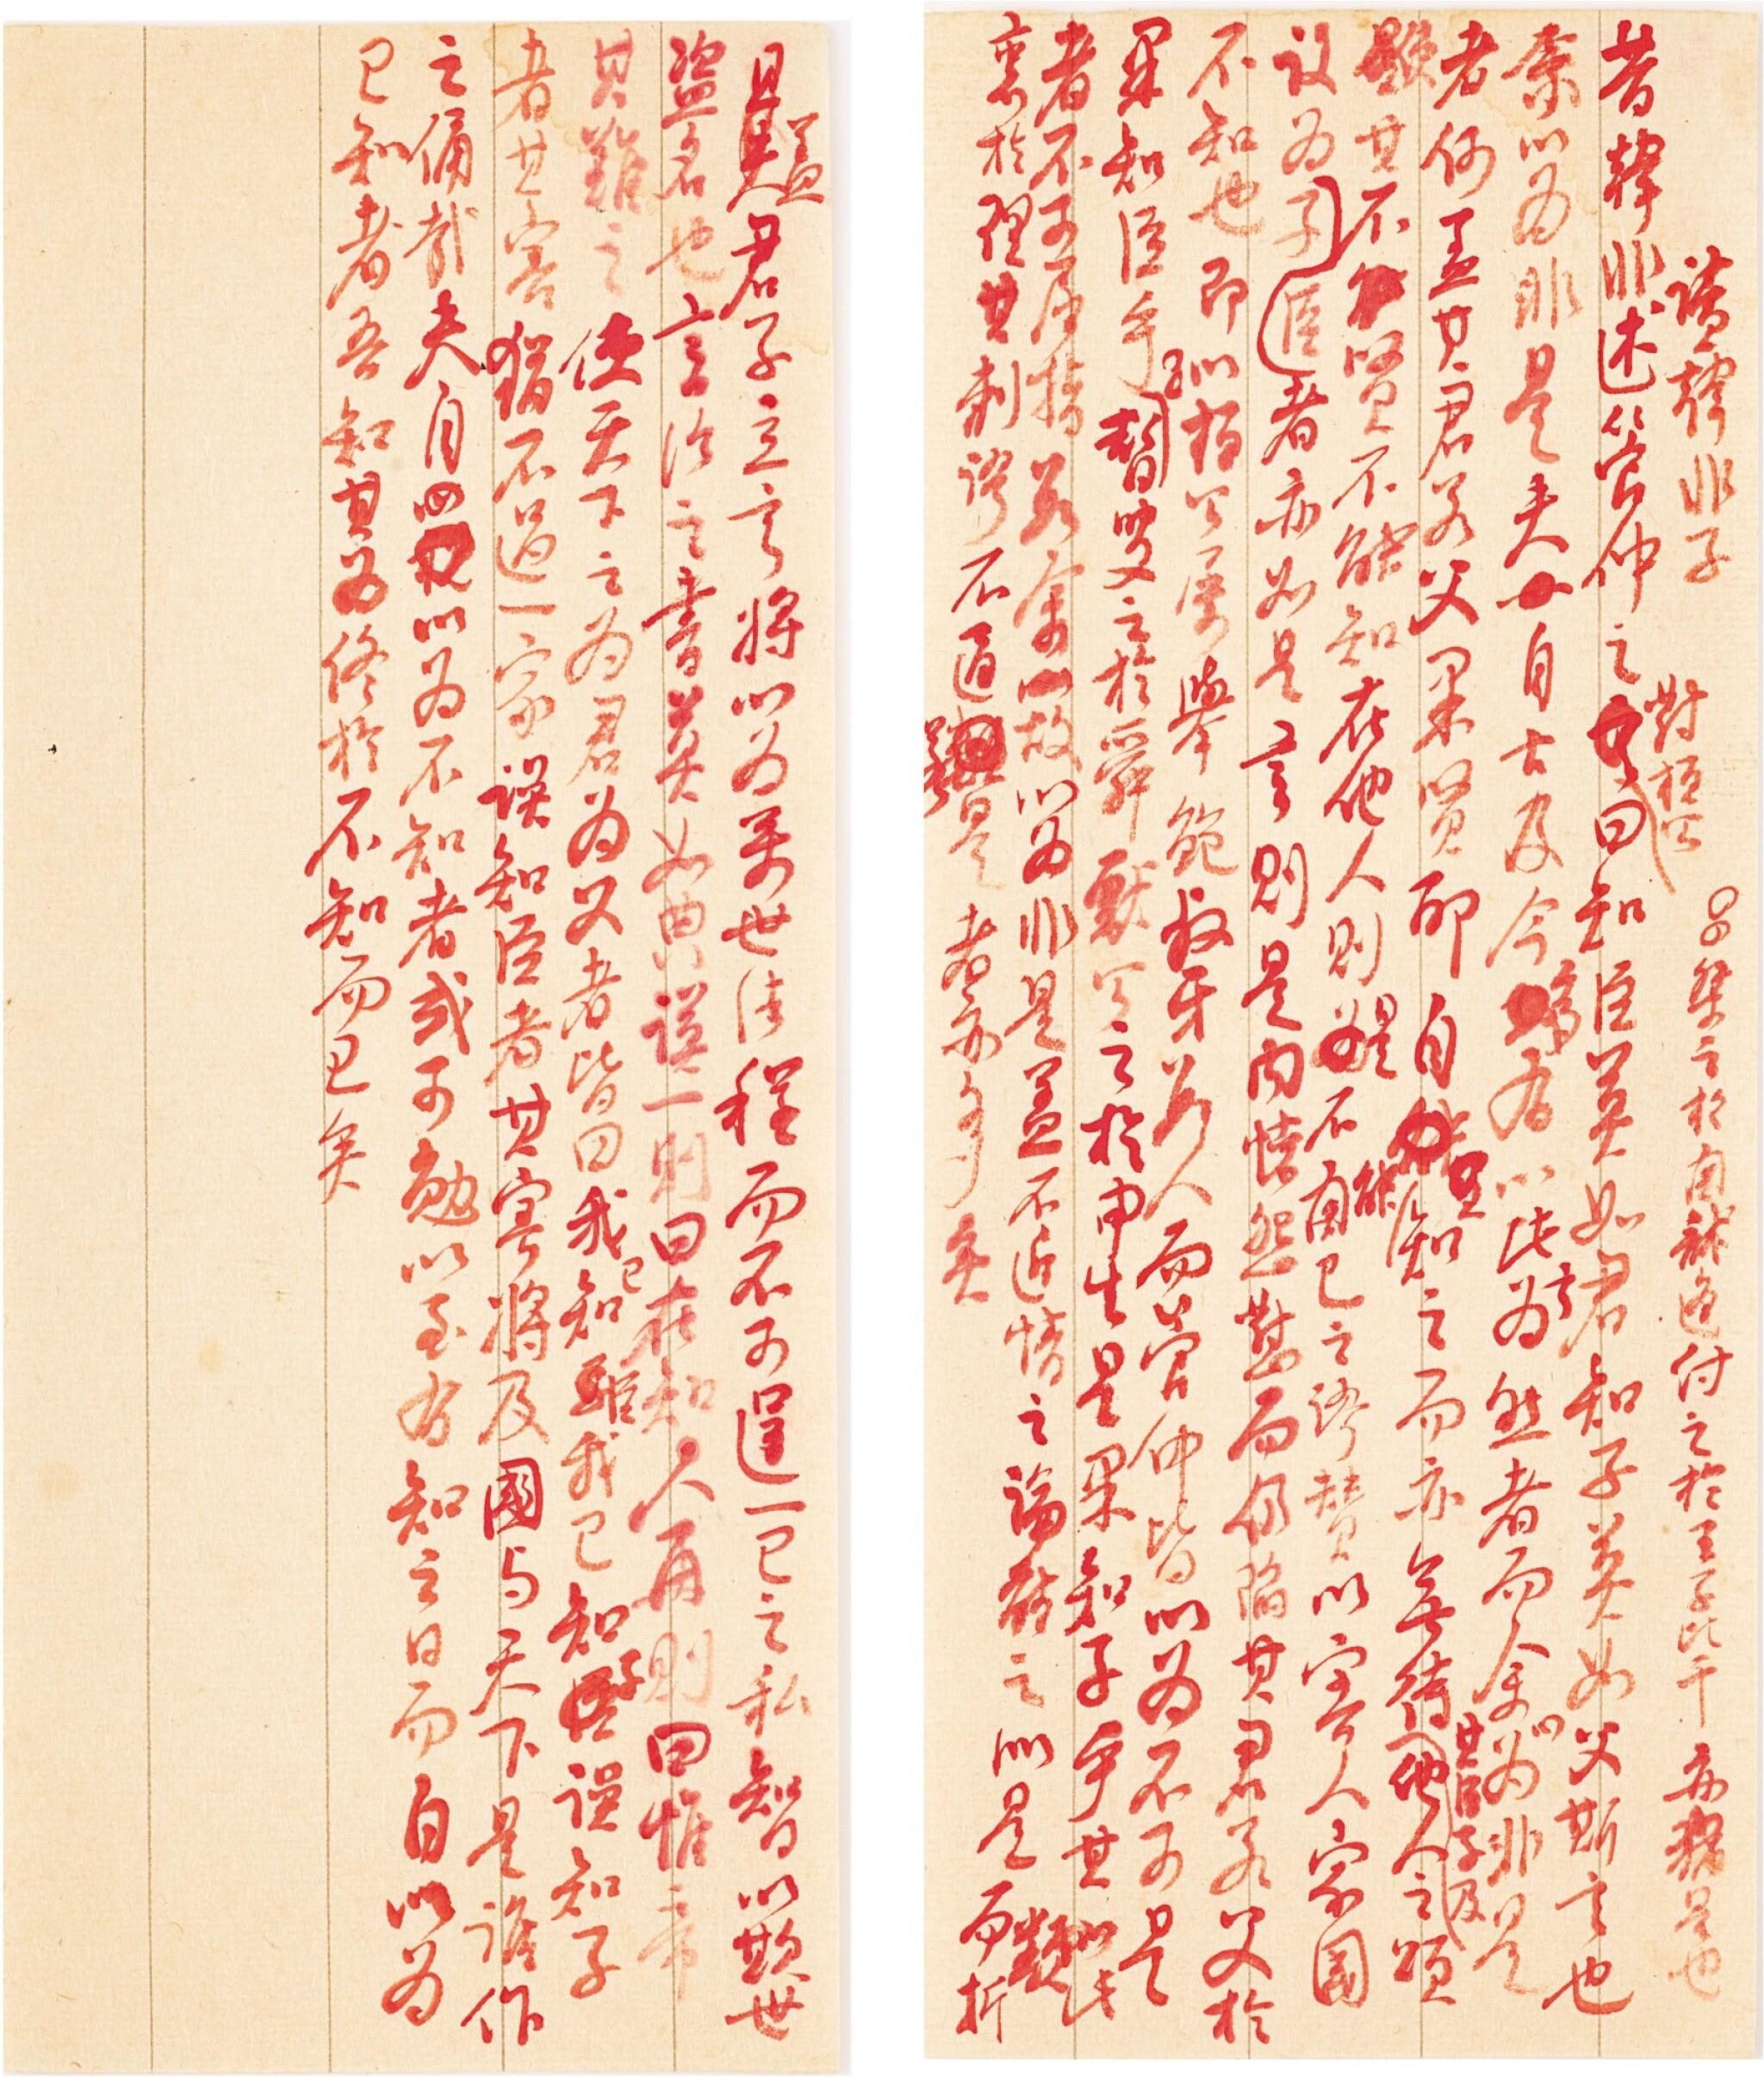 View full screen - View 1 of Lot 3120. Hongli (Emperor Qianlong) 1711-1799 弘曆(乾隆帝) 1711-1799 | Manuscript of the Preface of Hanfeizi 《讀韓非子》手稿.